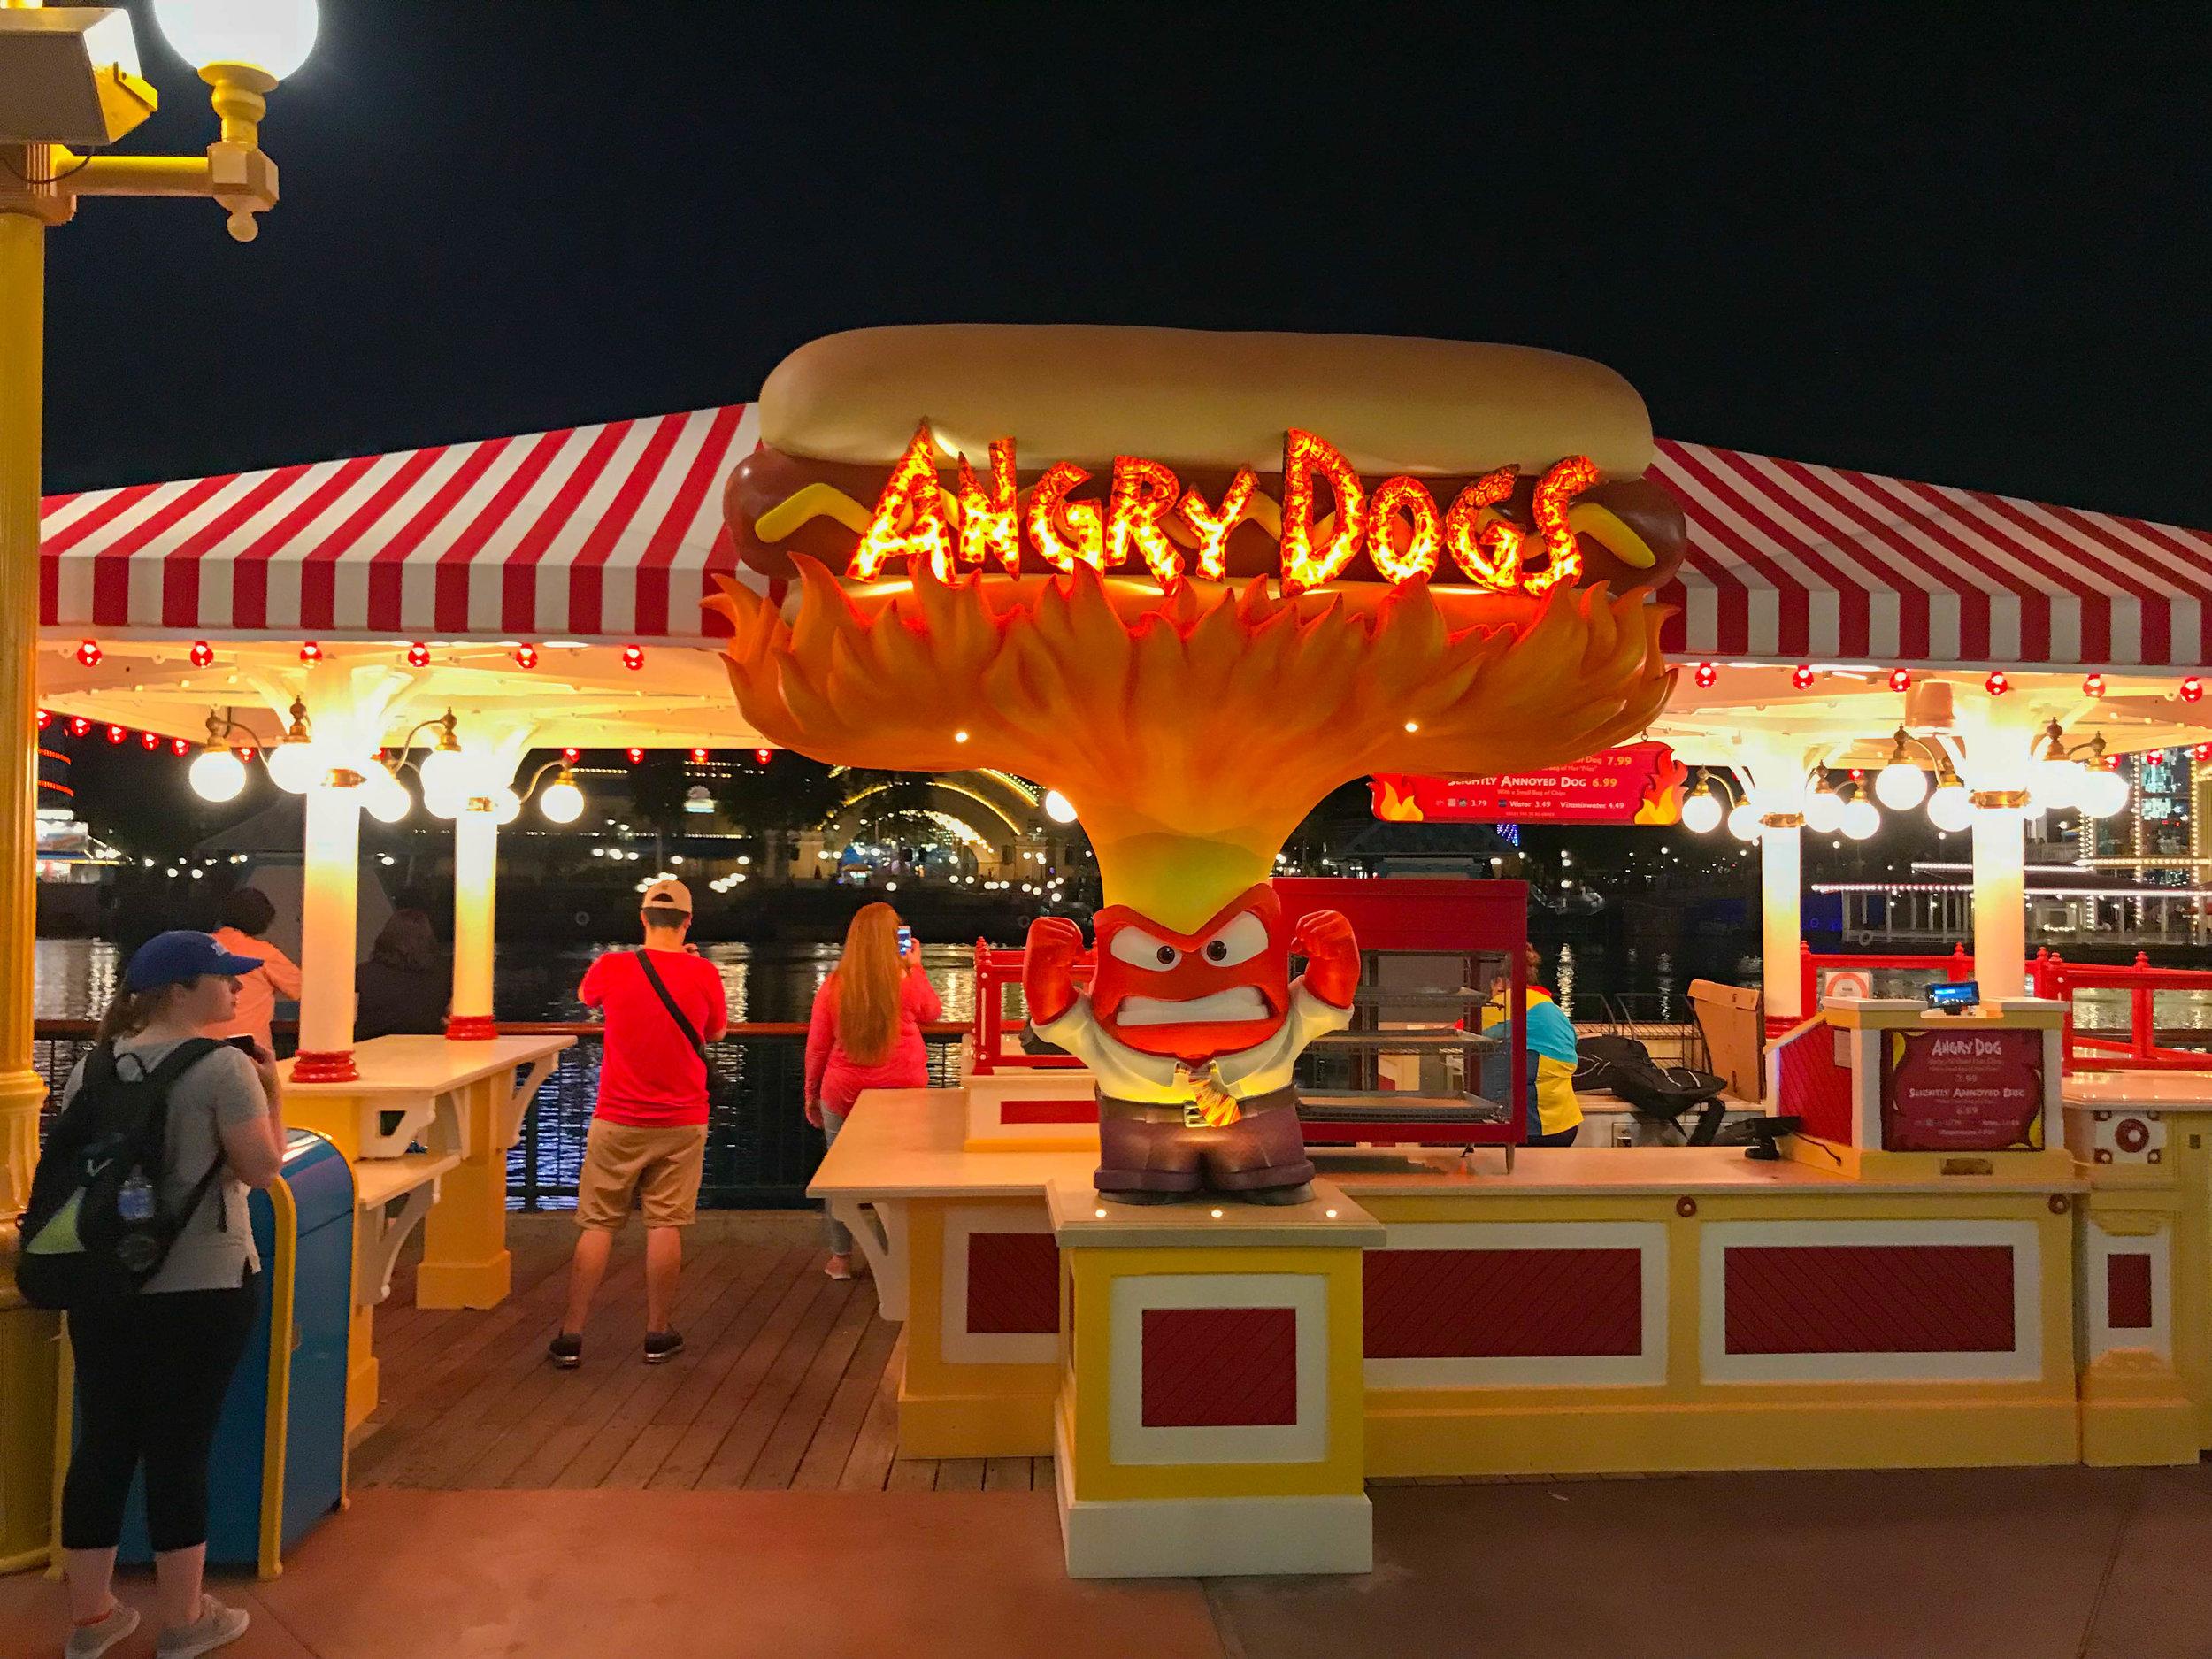 Disneyland_Pixar_Pier_Angry_dogs.jpg